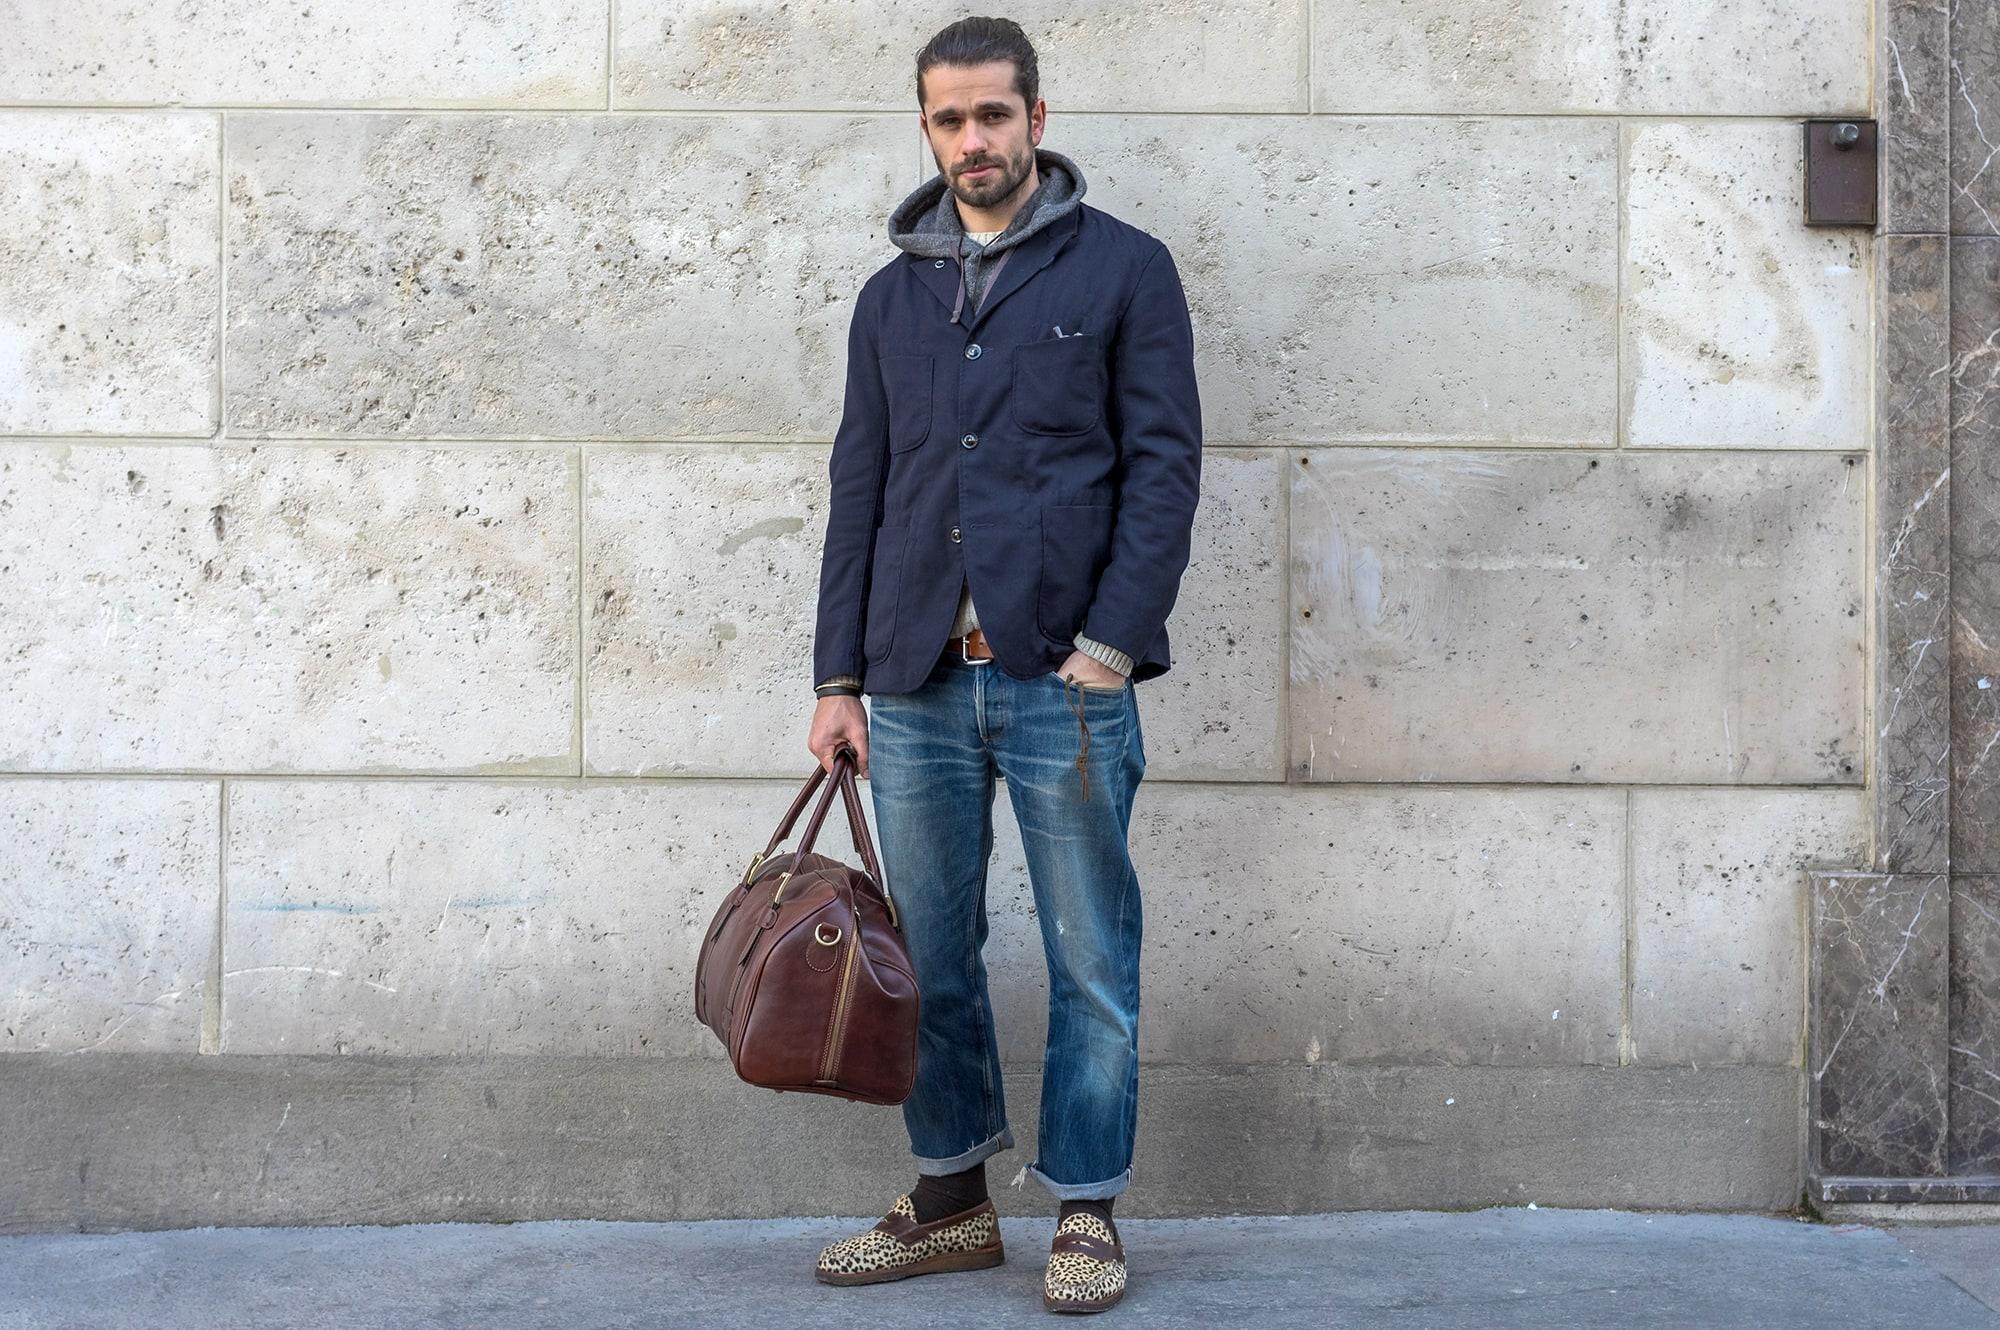 blog mode homme street heritage workwear - Engineered garments bedford jacket @ hooded interliner - Edwin knit - Frères de voyage- APC jeans - Yuketen leopard penny loafer